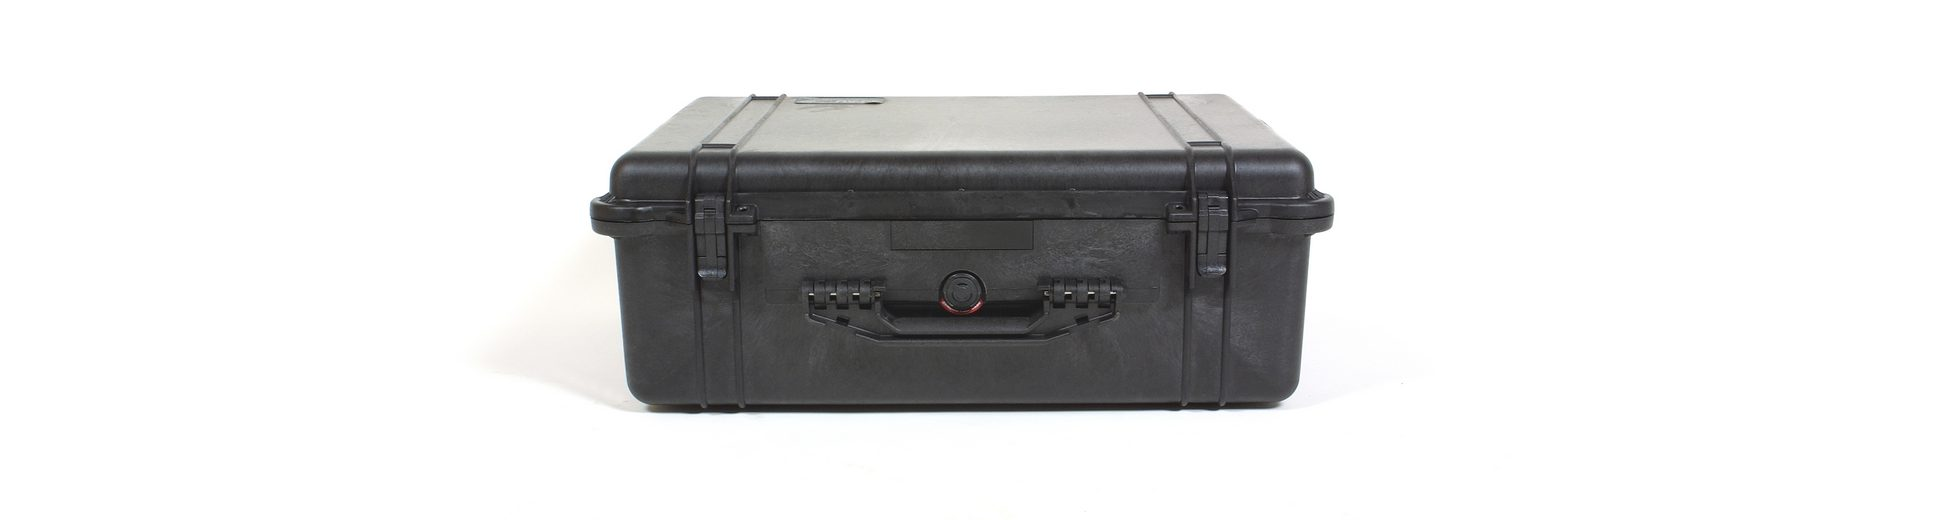 Peli Campingtruhe & -Kiste »box 1600 ohne Schaumeinsatz«